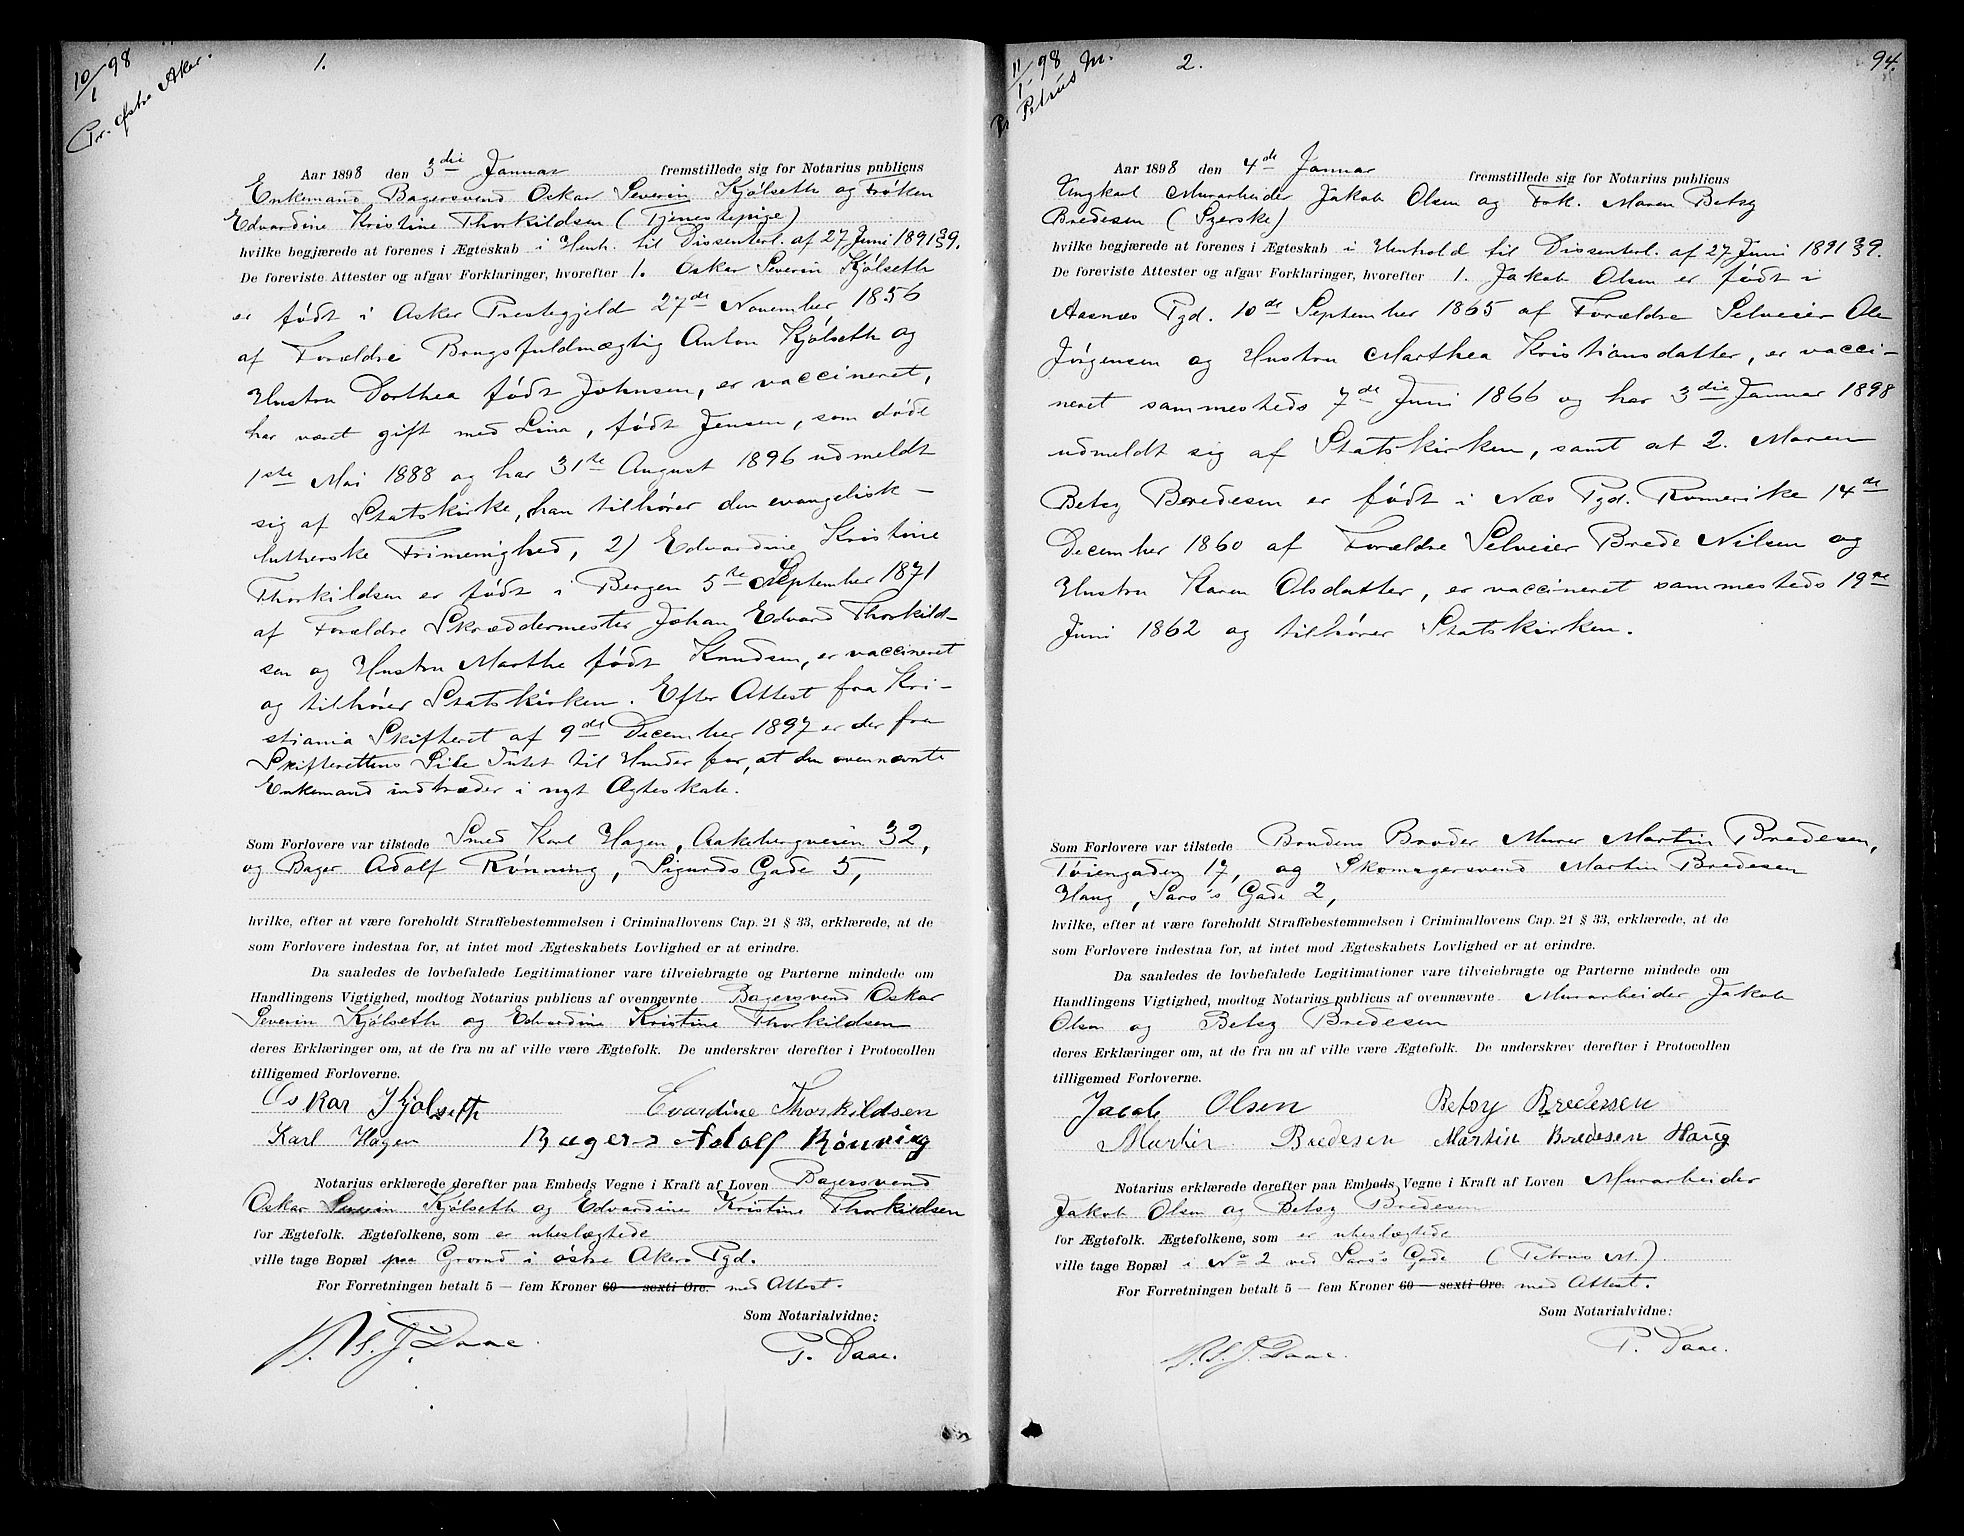 SAO, Oslo byfogd avd. I, L/Lb/Lbb/L0005: Notarialprotokoll, rekke II: Vigsler, 1897-1902, s. 93b-94a